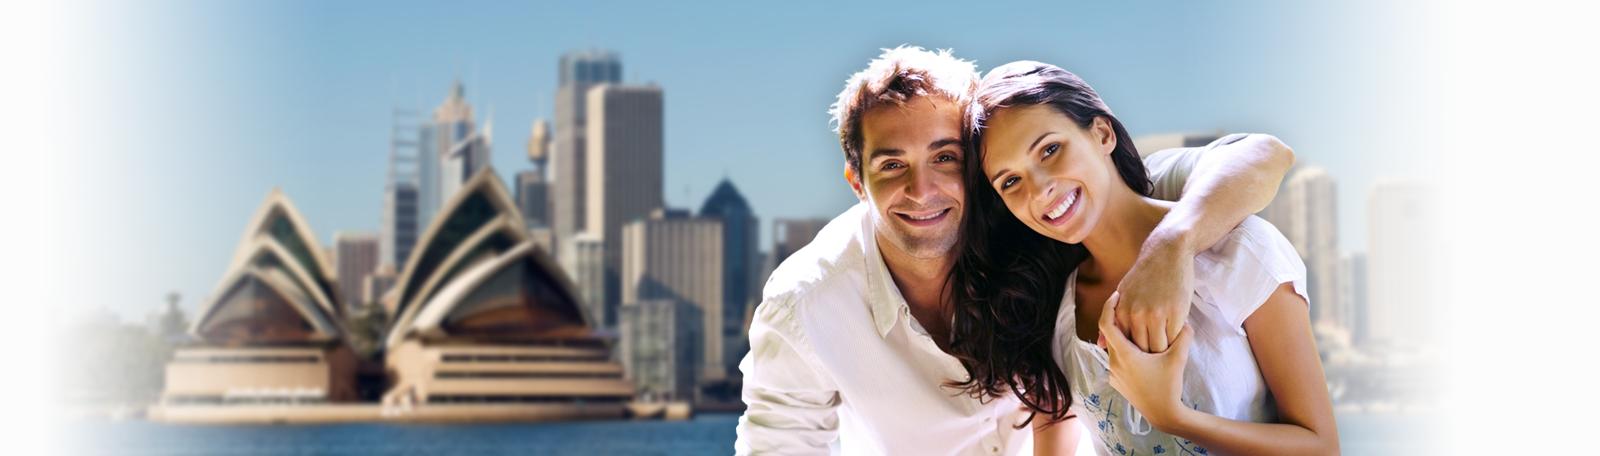 happy sydney dating